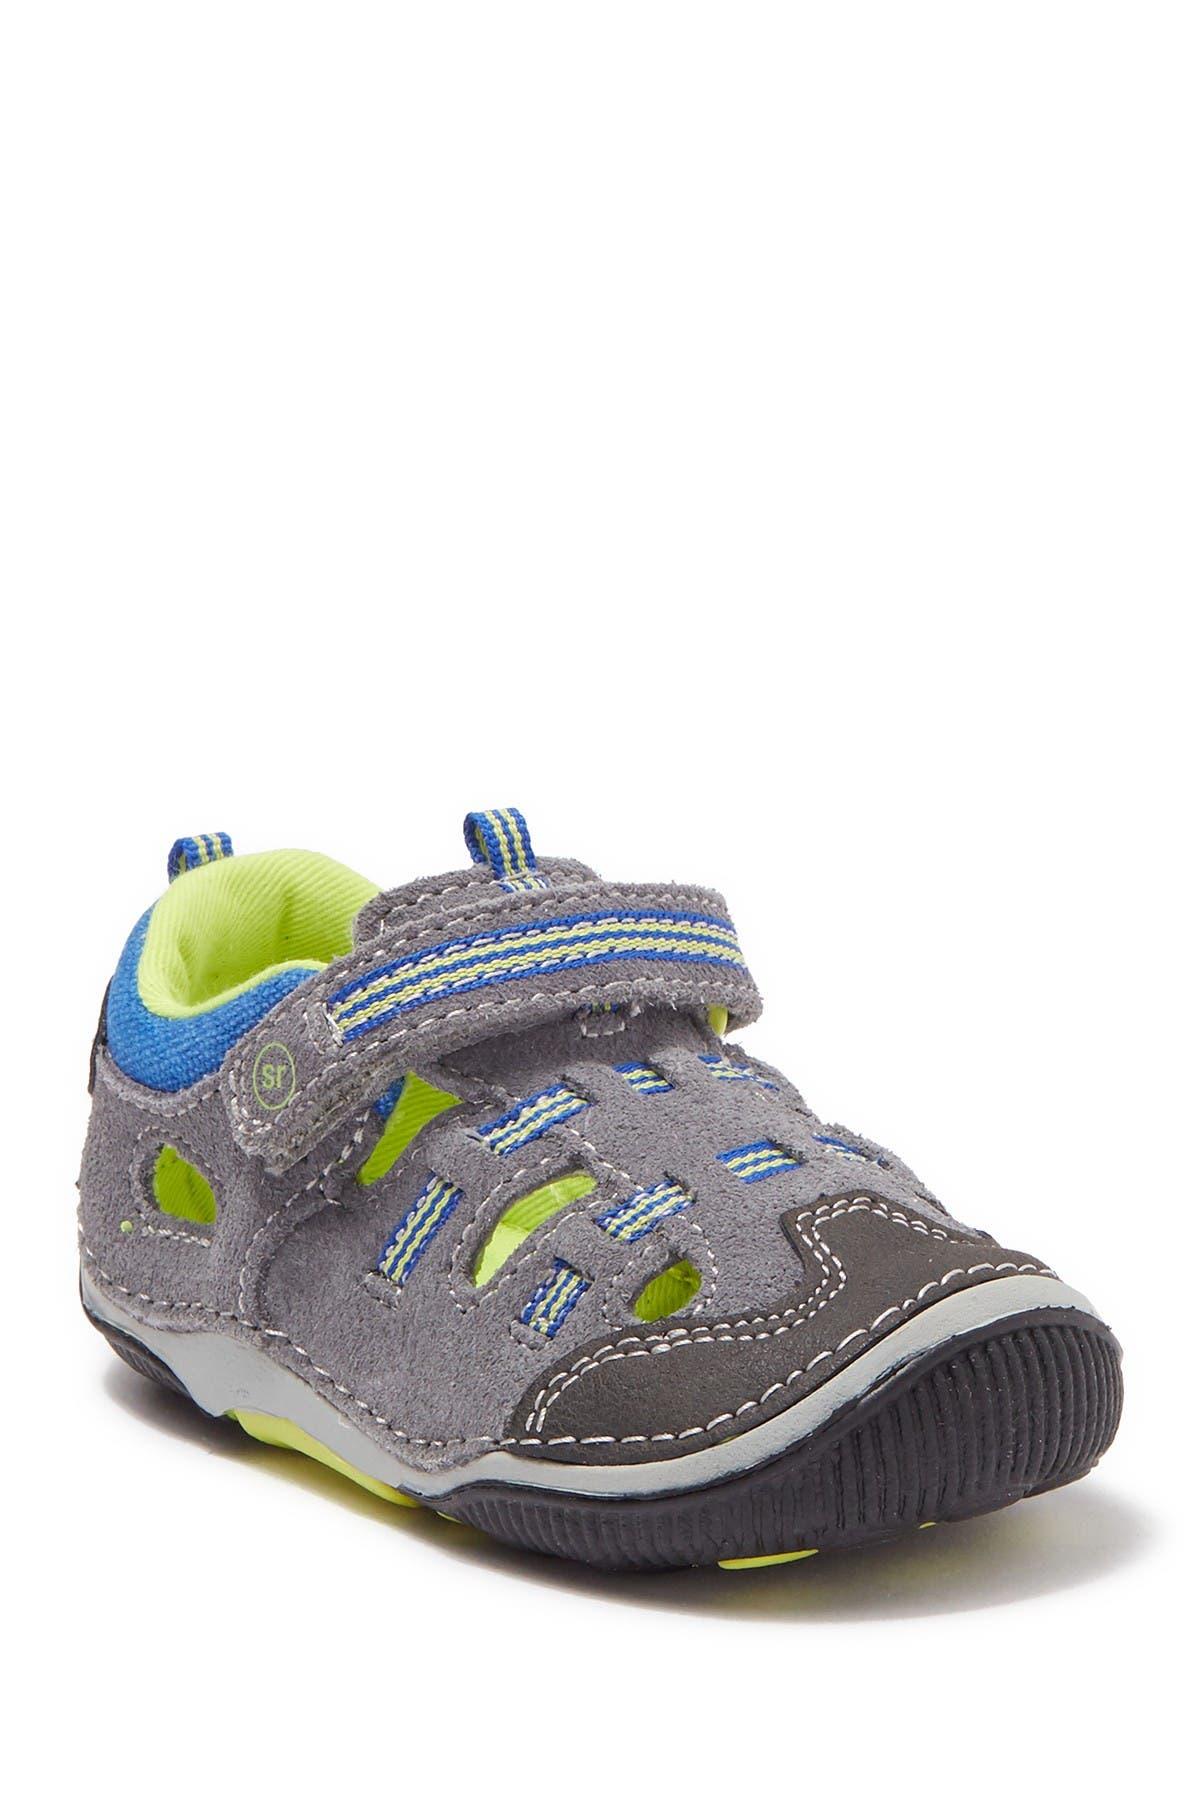 Image of Stride Rite Srt Reggie Sneaker - Multiple Widths Available